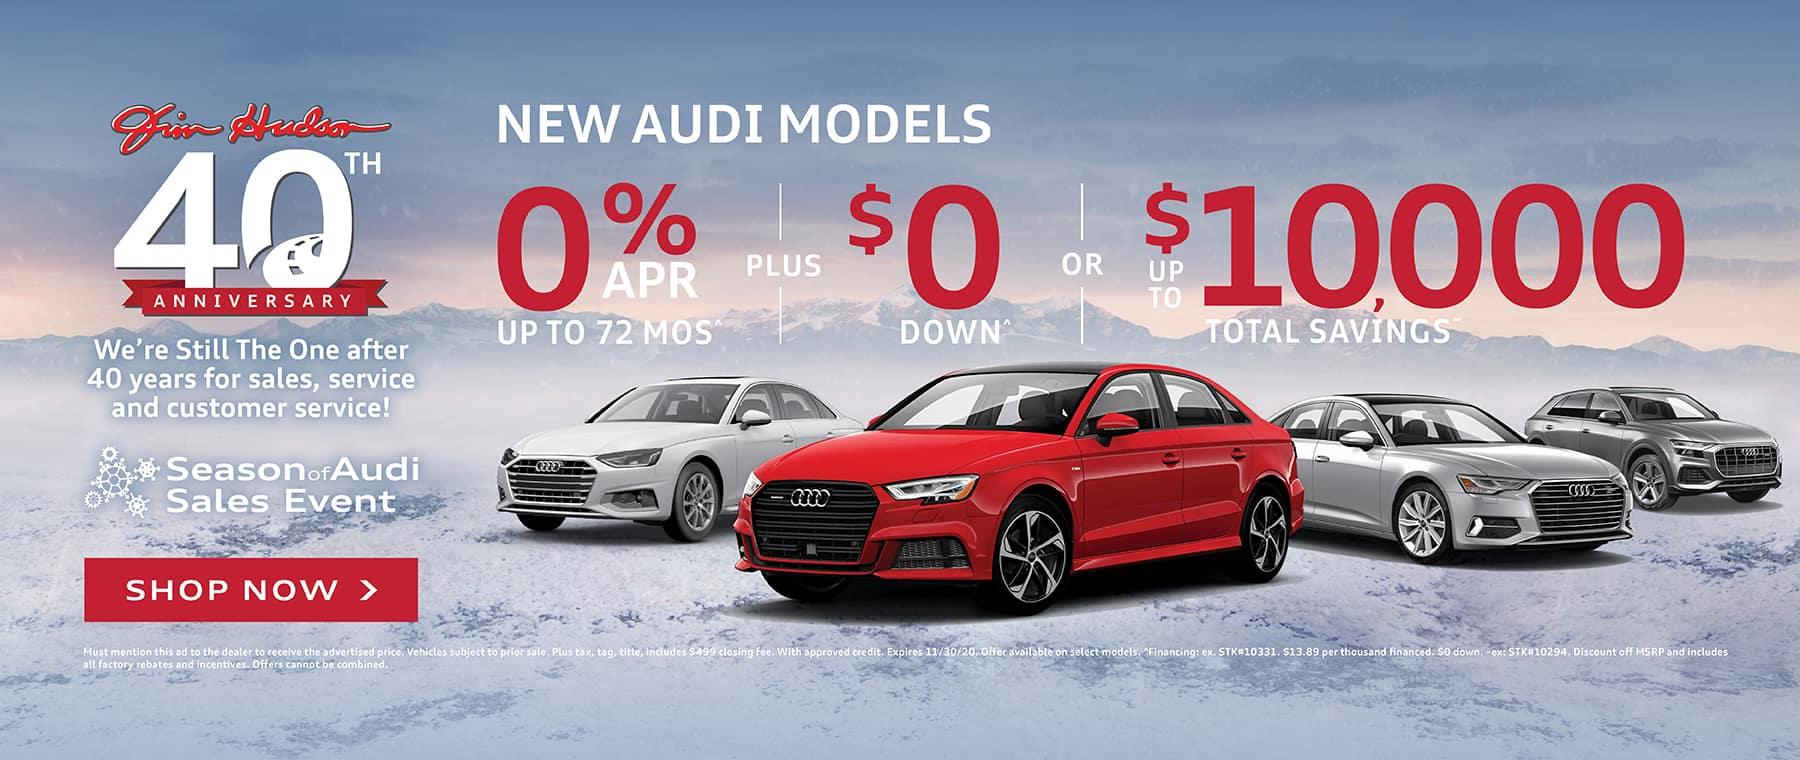 New Audi Vehicles